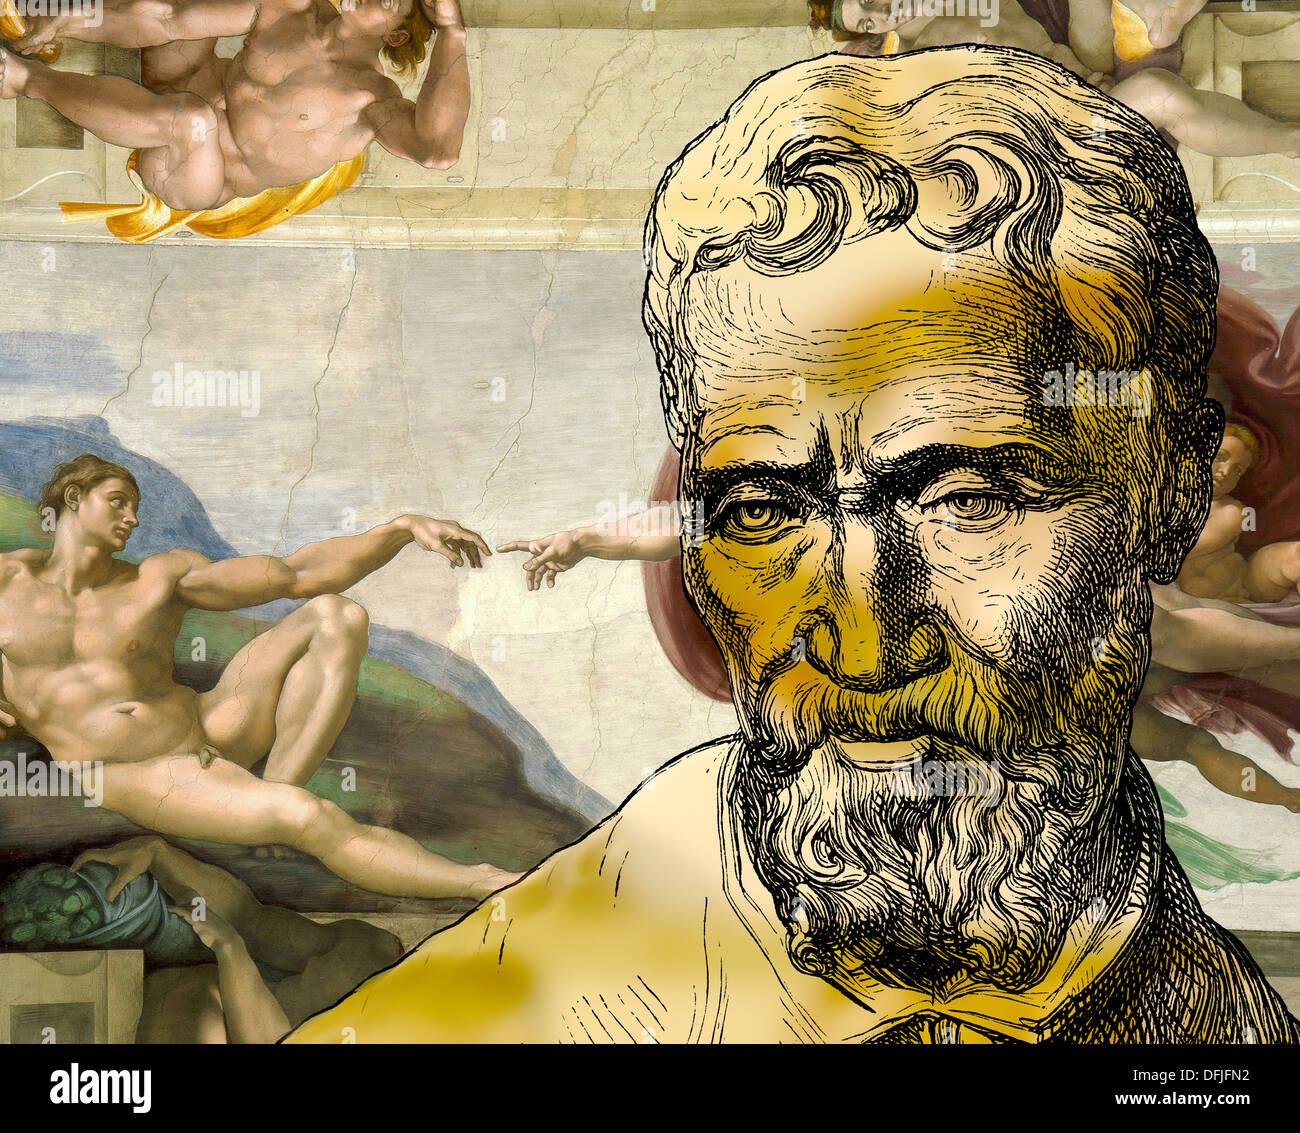 Creation of Adam, Michelangelo Buonarroti, 1475 - 1564, Italian painter, sculptor, architect and poet of the Renaissance Stock Photo